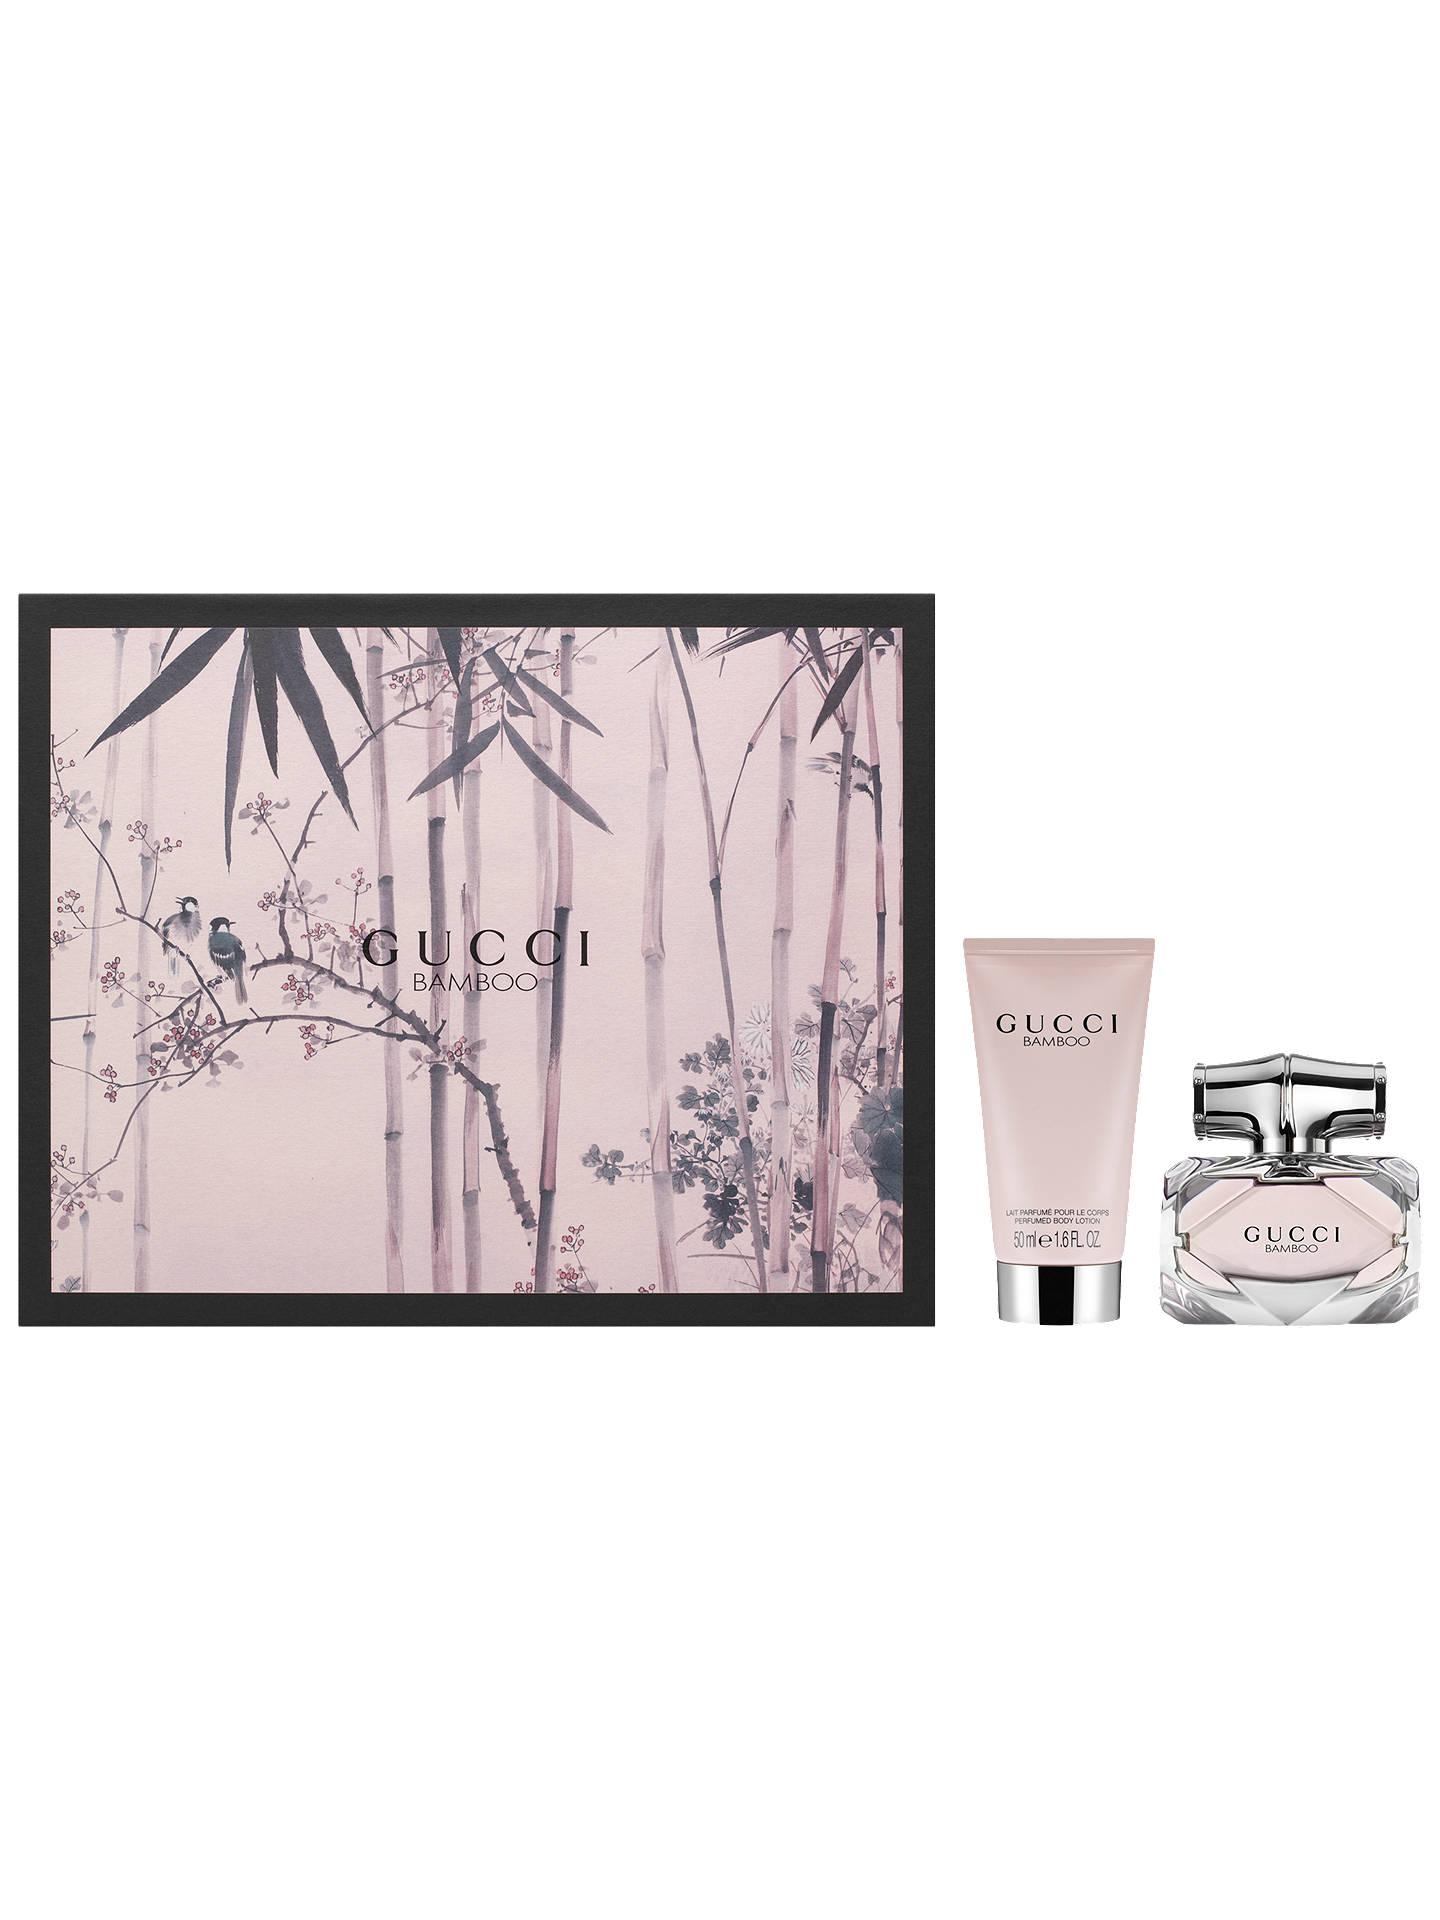 acffe9c2d Buy Gucci Bamboo 30ml Eau de Parfum Fragrance Gift Set Online at  johnlewis.com